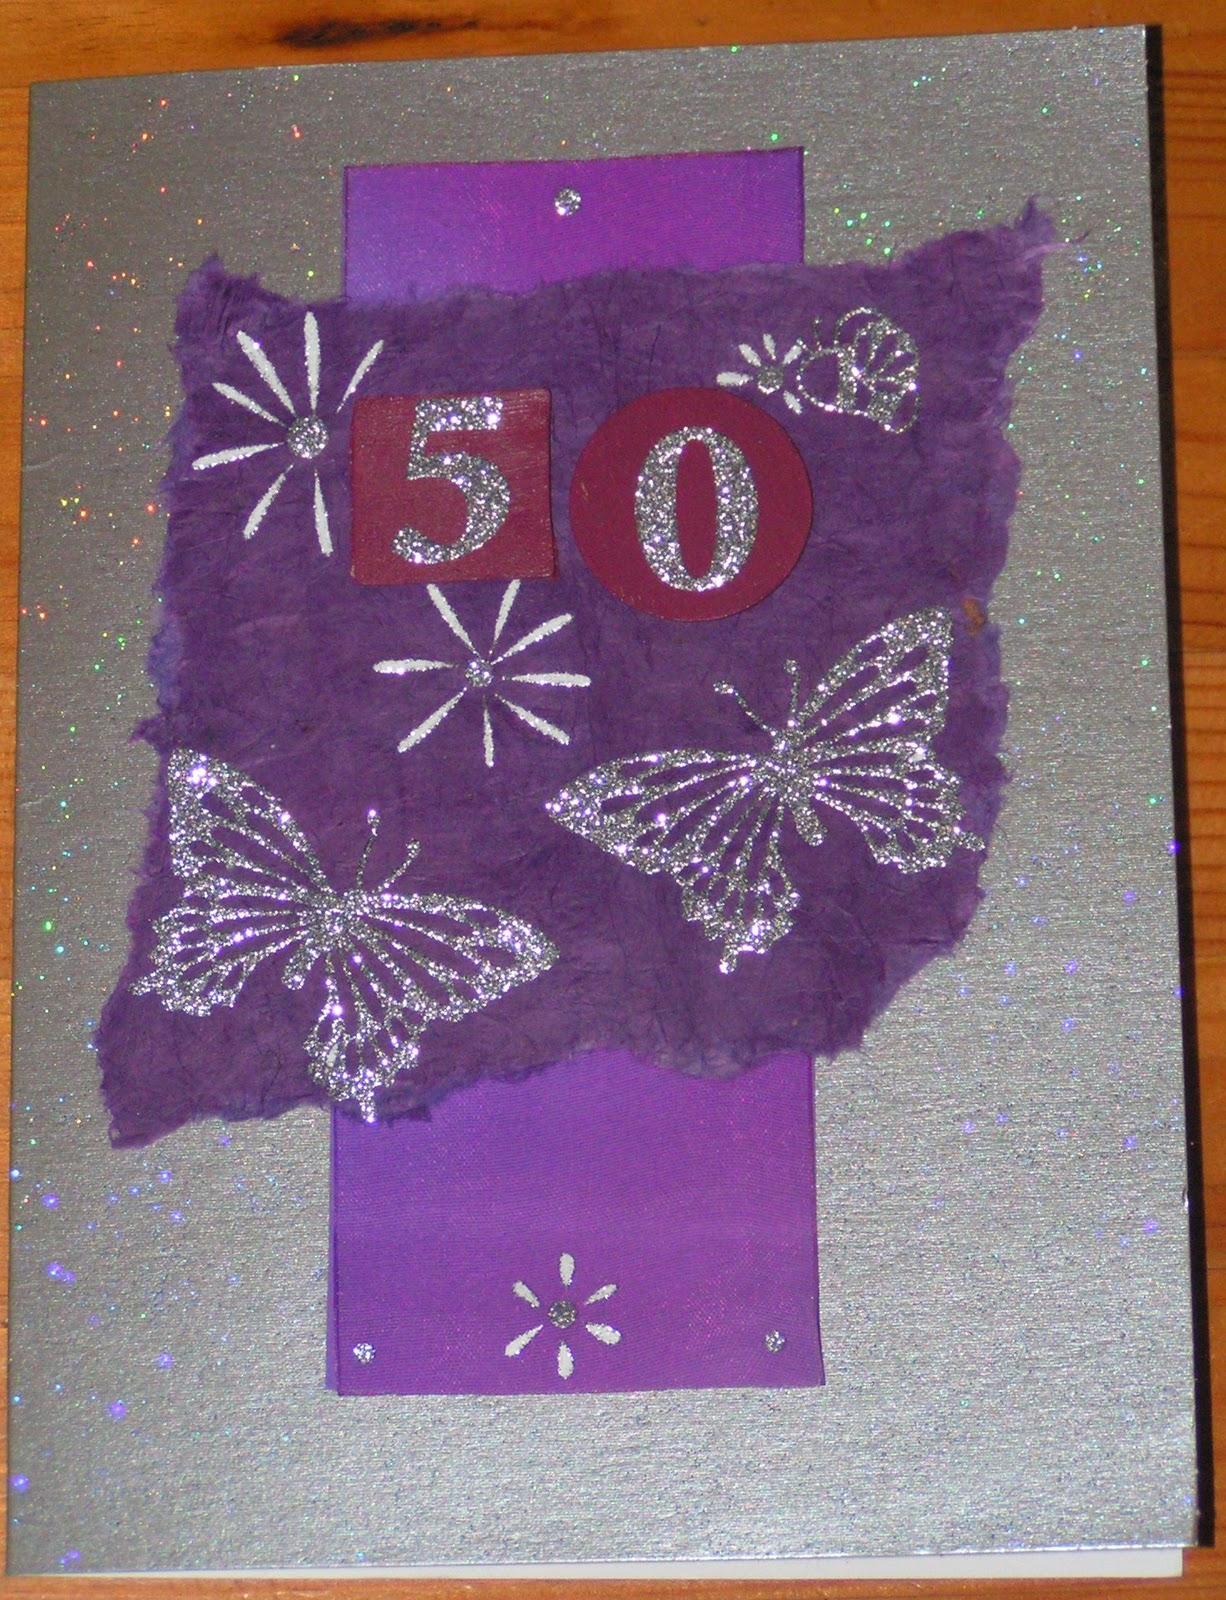 http://1.bp.blogspot.com/-rsp5sGE9FBk/TvS9Pn_2OqI/AAAAAAAABIA/RhyFlvR92PA/s1600/pre-xmas+creativity+010.JPG